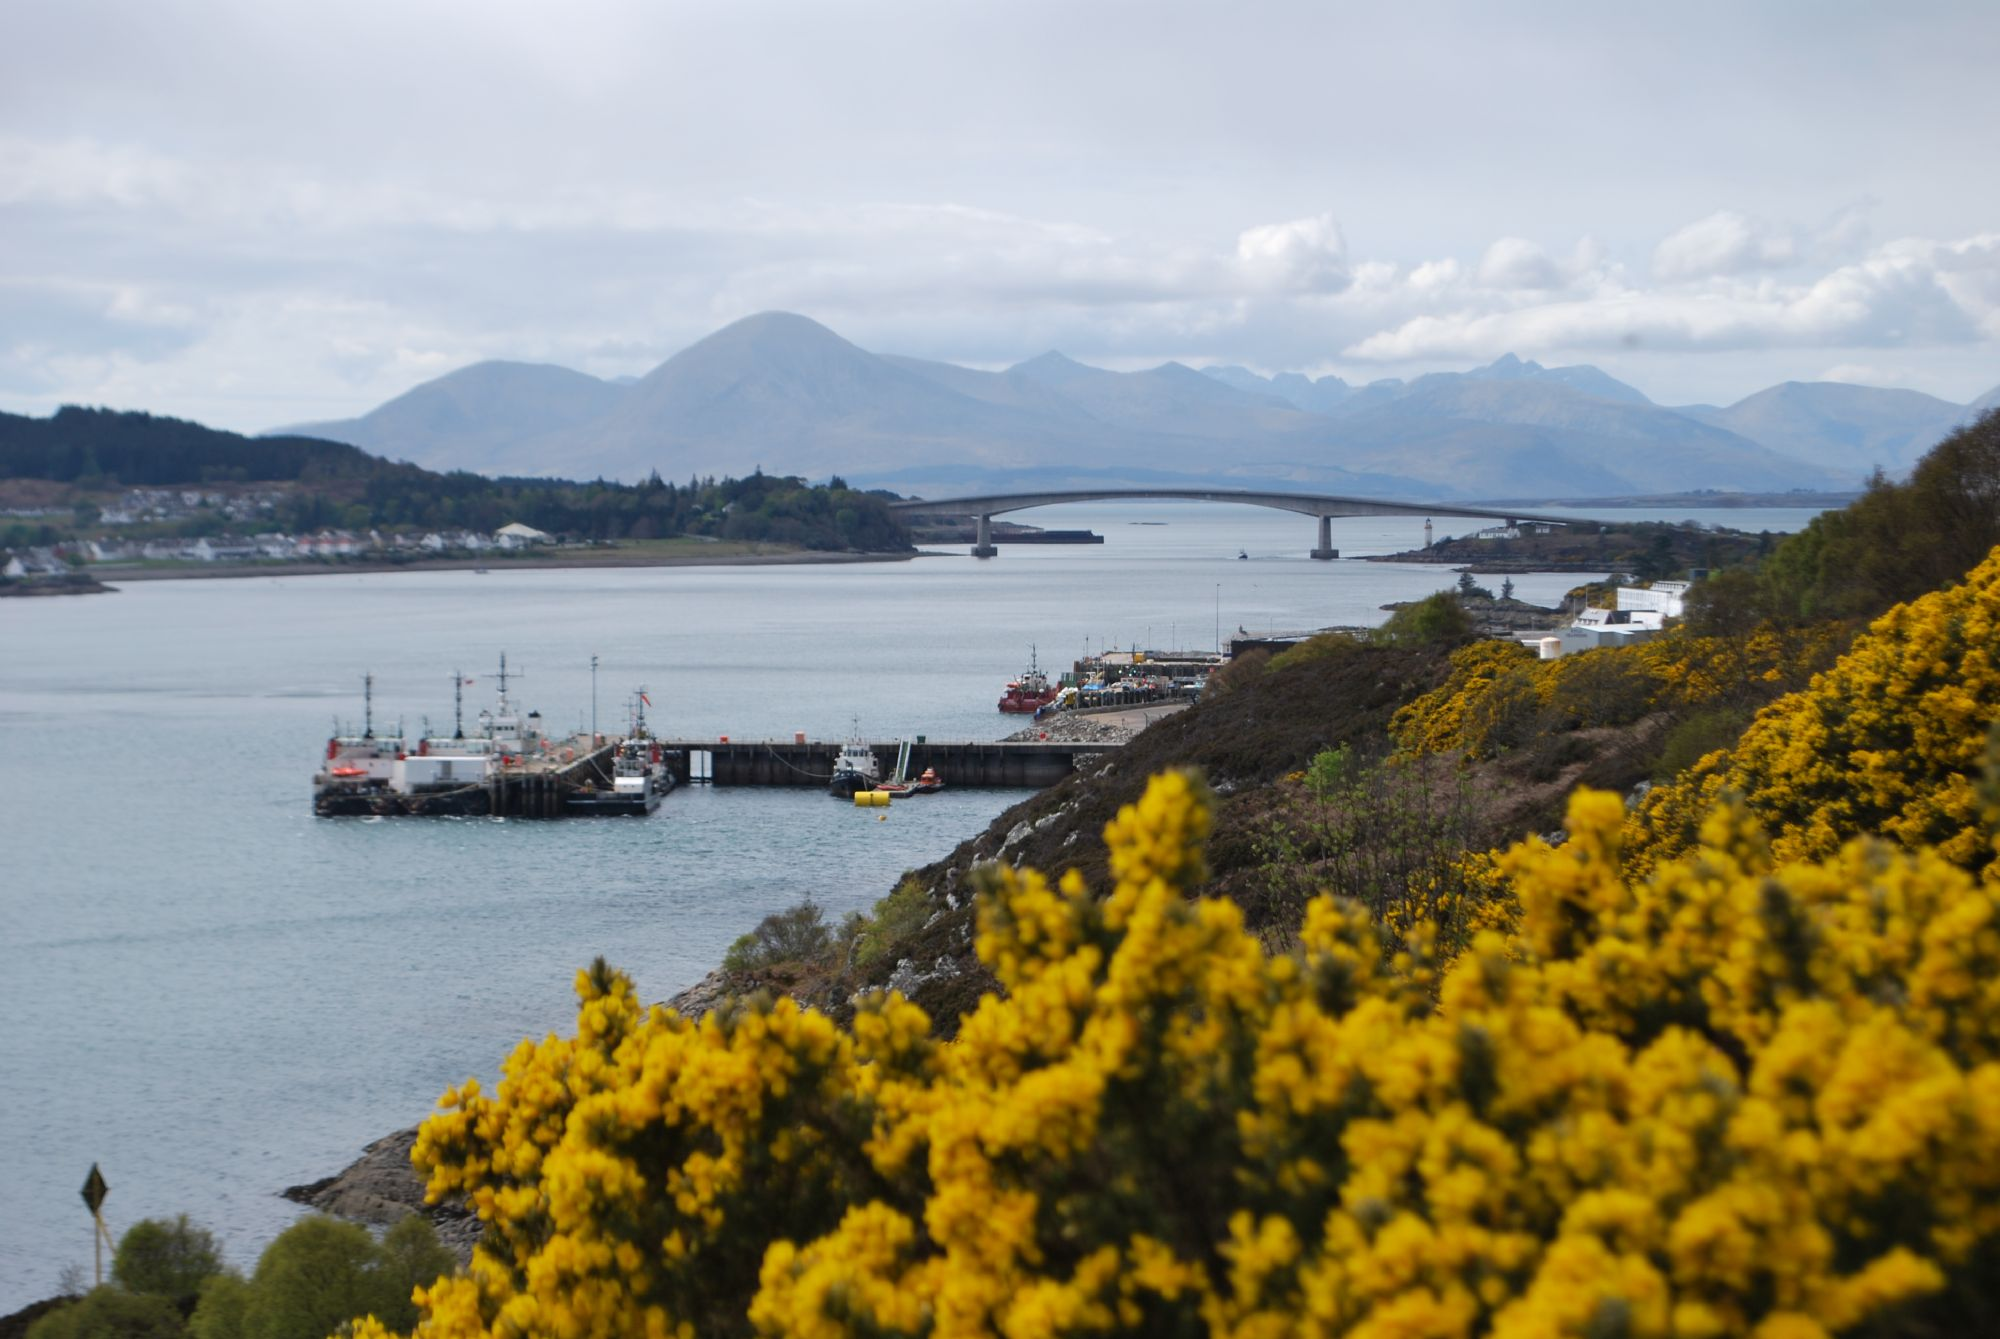 The bridge to the Isle of Sky